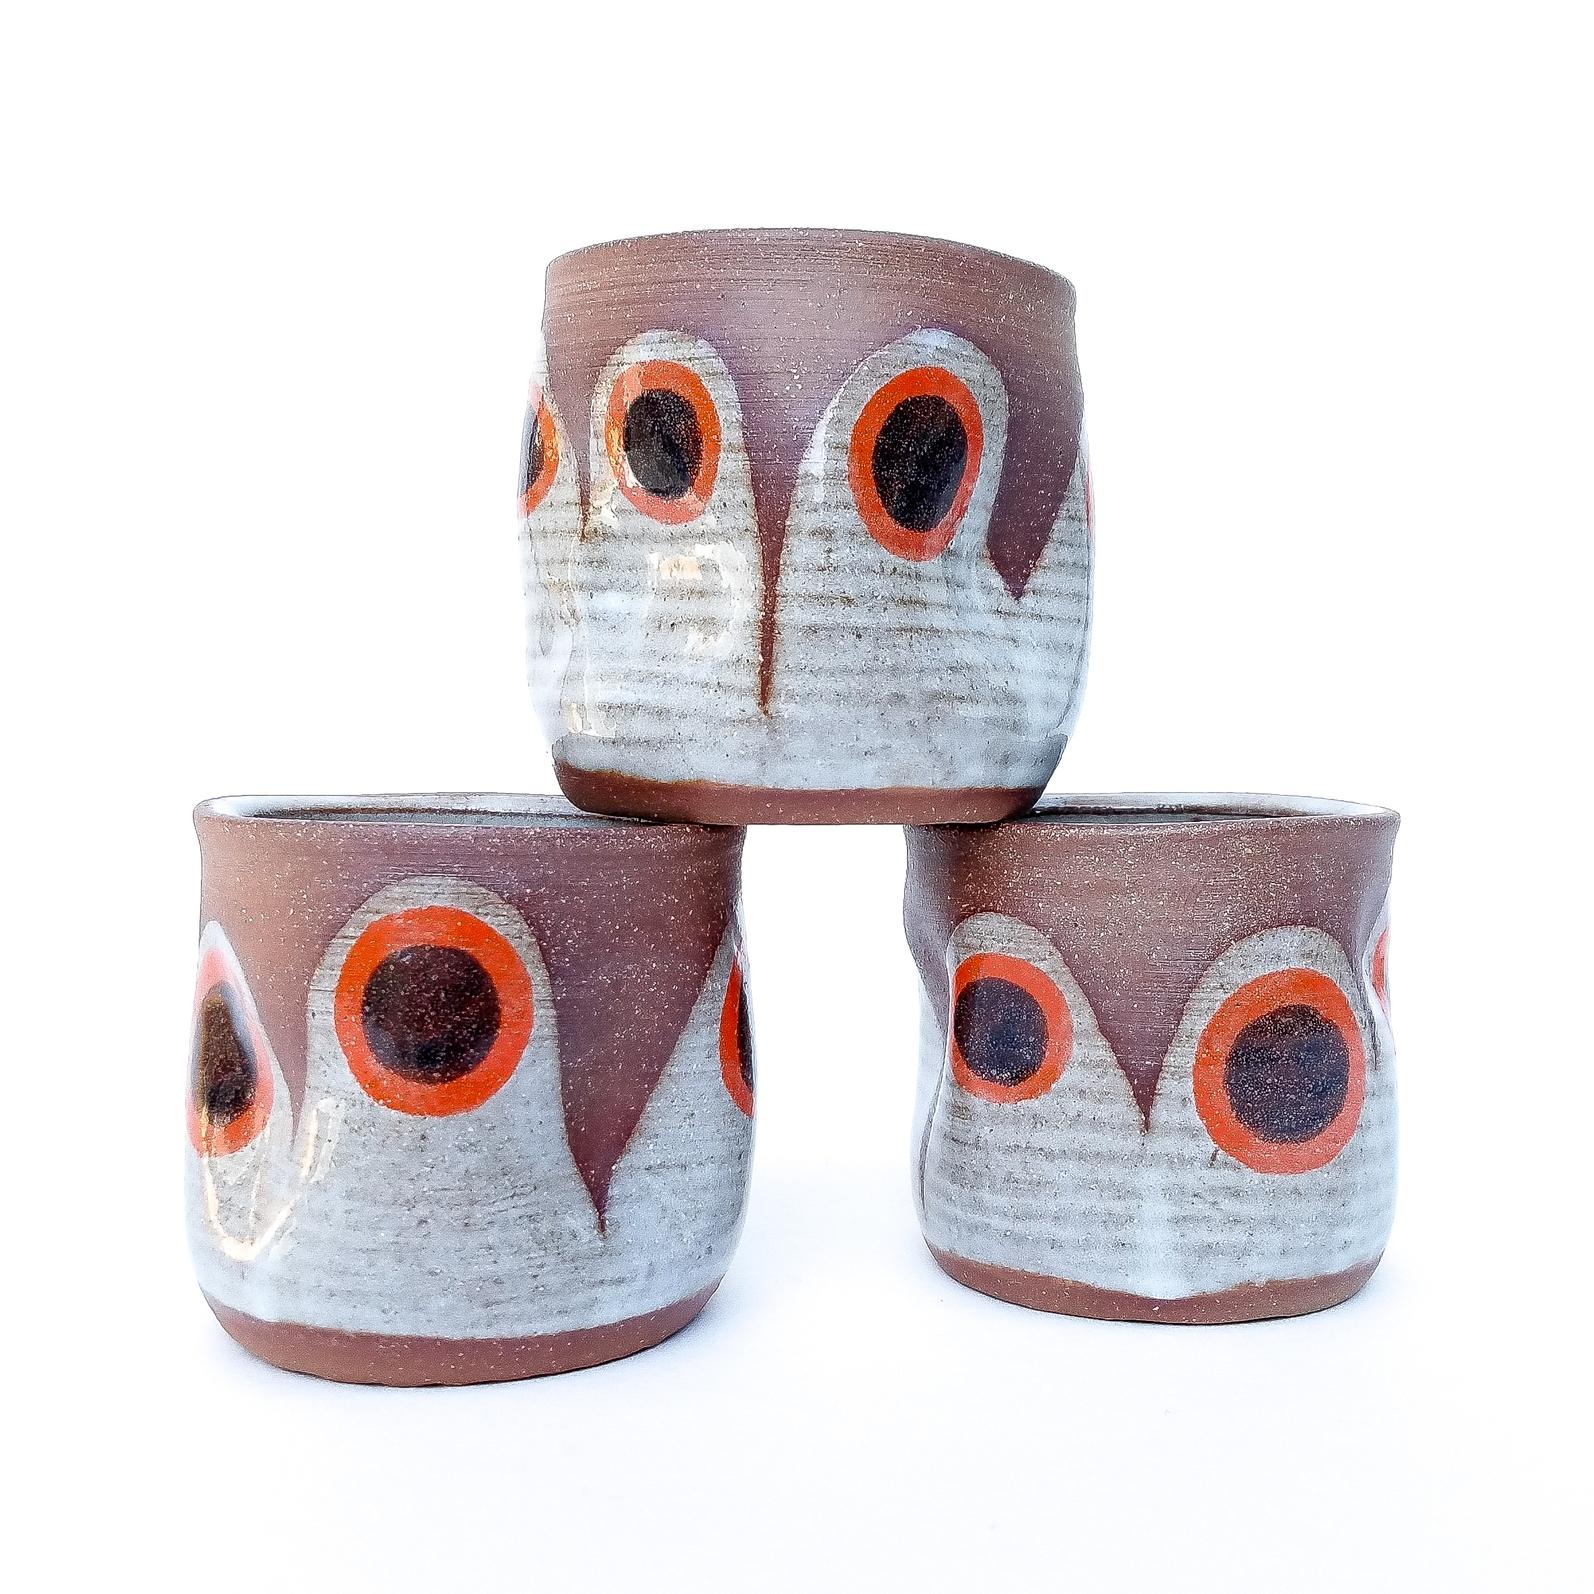 Ceramic_Erickson_$34_#2.jpg